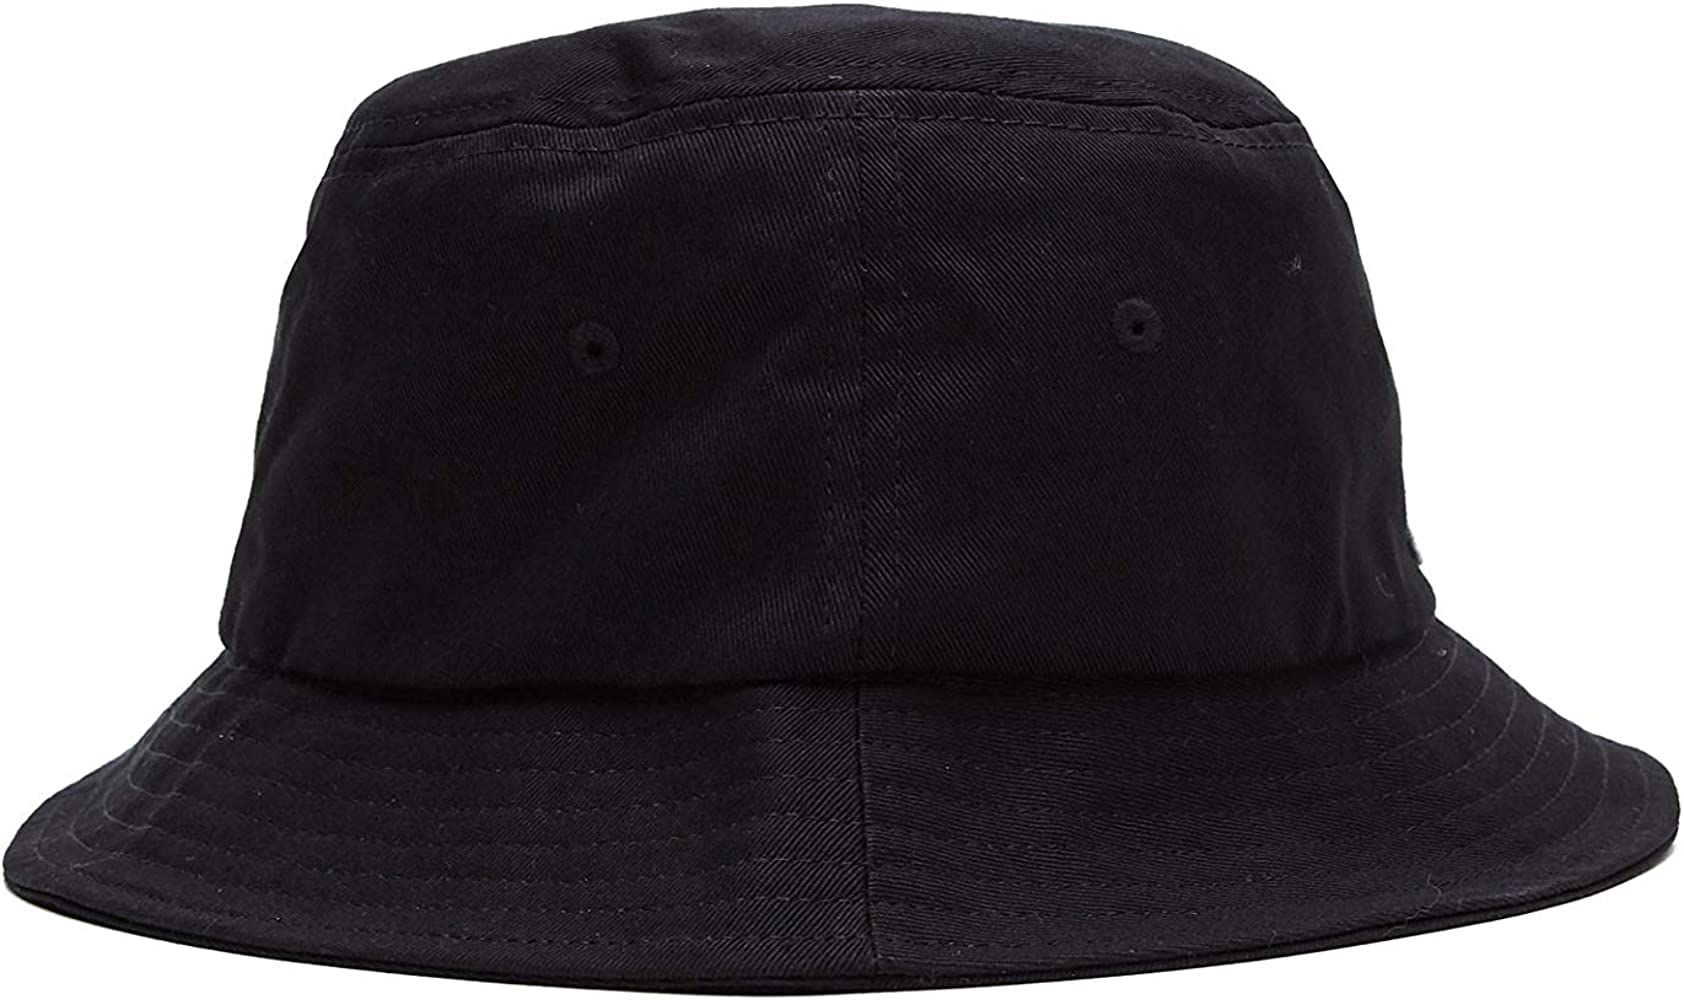 Obey – Sombrero Bucket – Sleeper – Negro – Talla única: Amazon.es ...